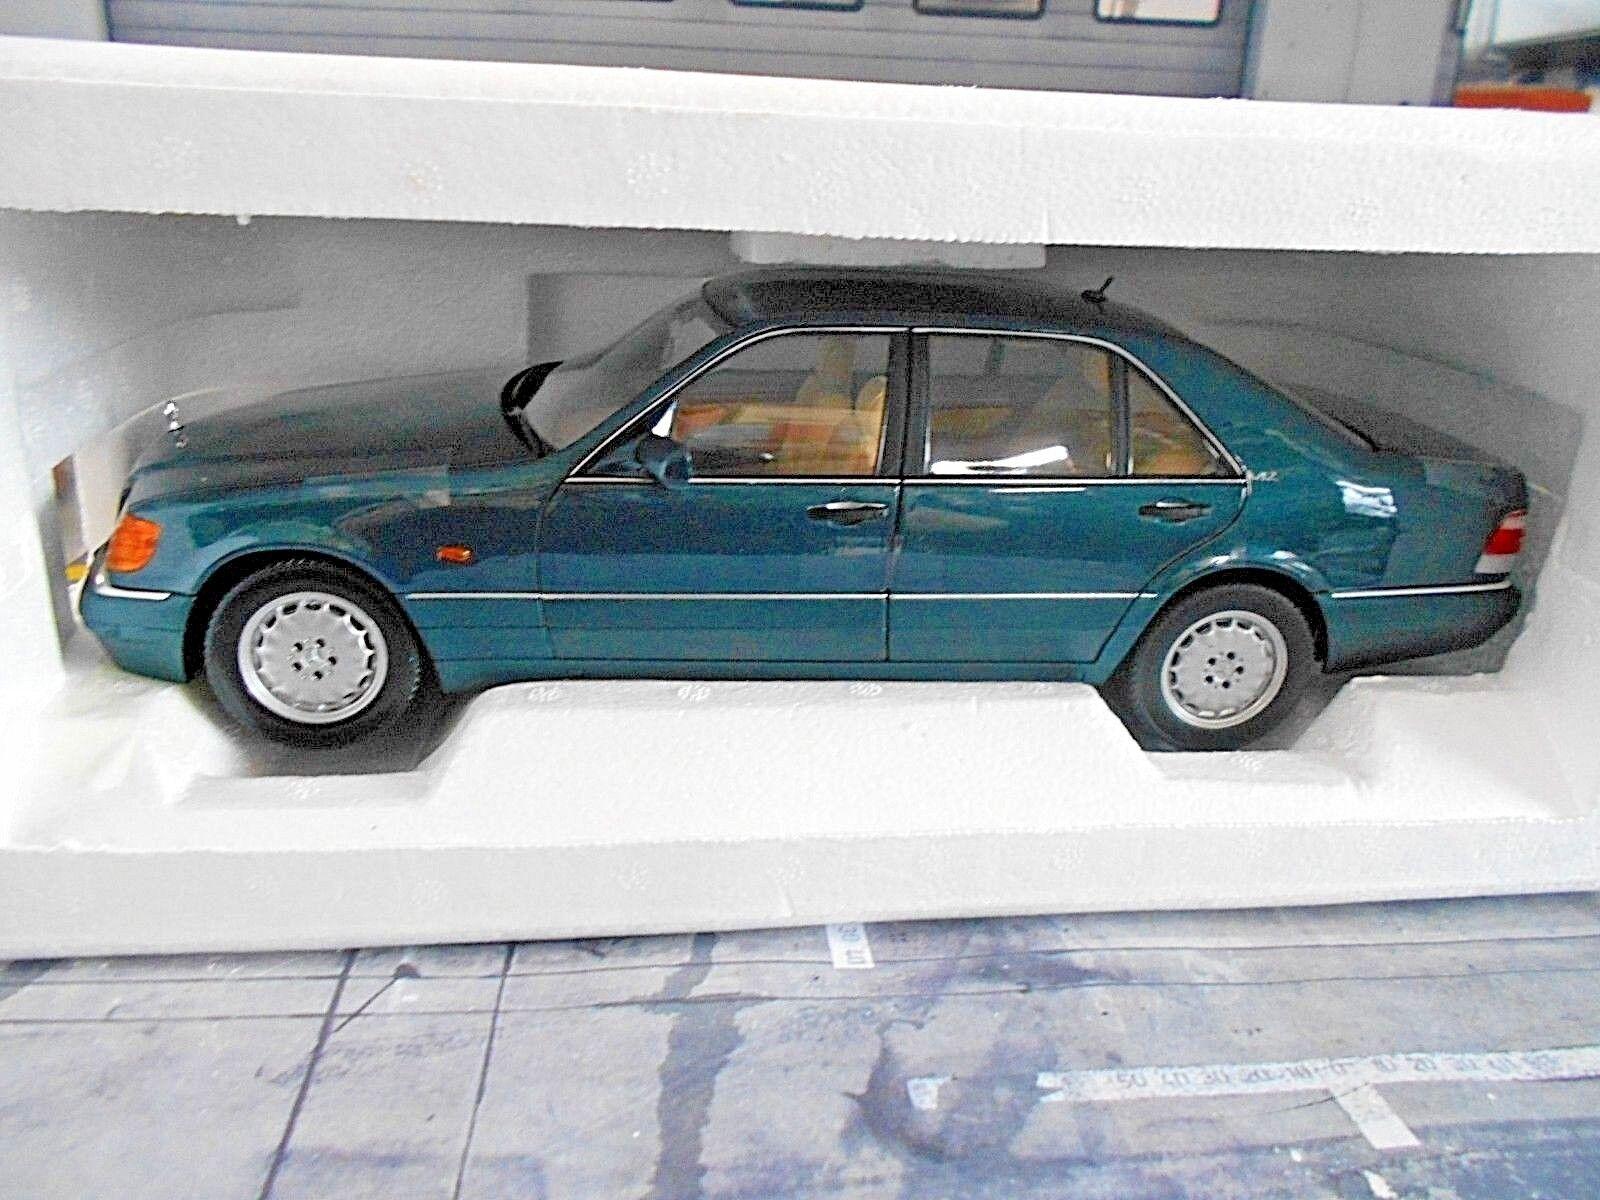 MERCEDES BENZ S-Klasse W140 600 S600 1997 1997 1997 green green 183593 Norev N 18 165b3b